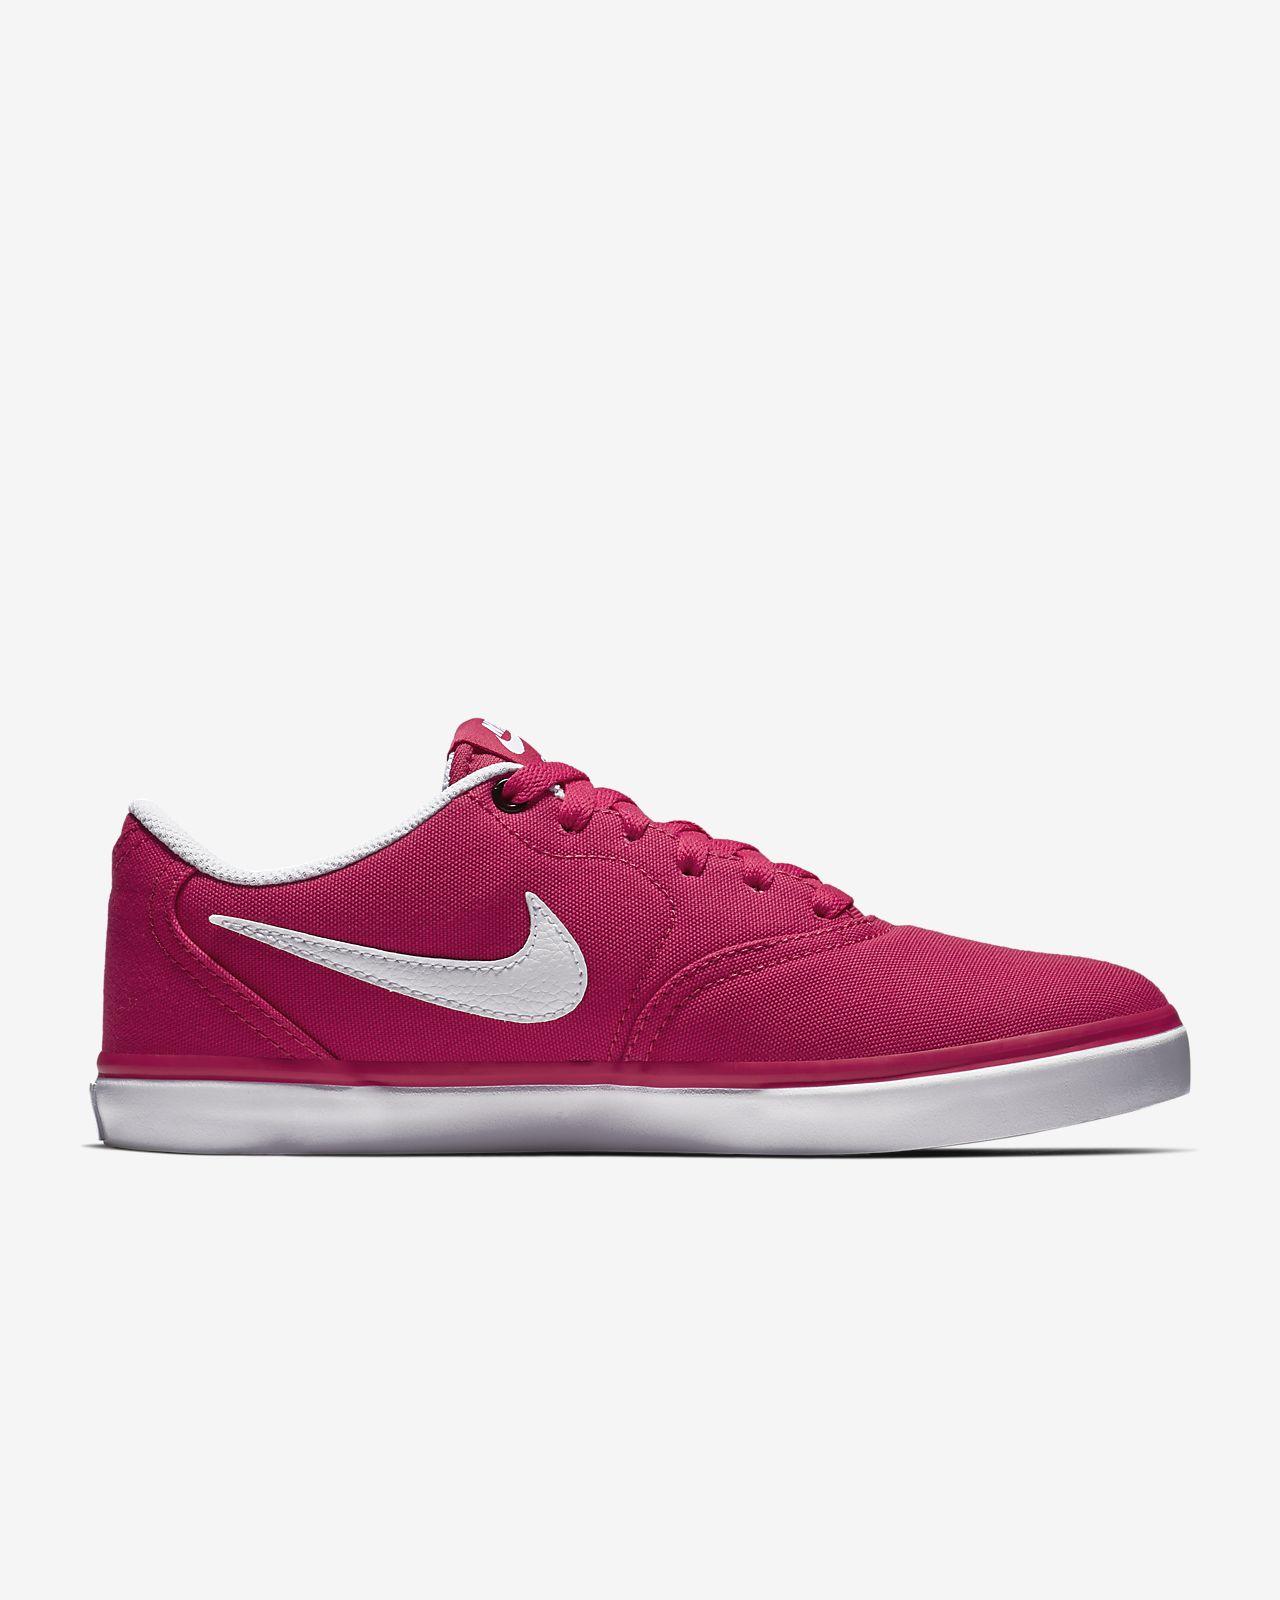 5dc6fa08594 Nike SB Check Solarsoft Canvas Women s Skateboarding Shoe. Nike.com AU